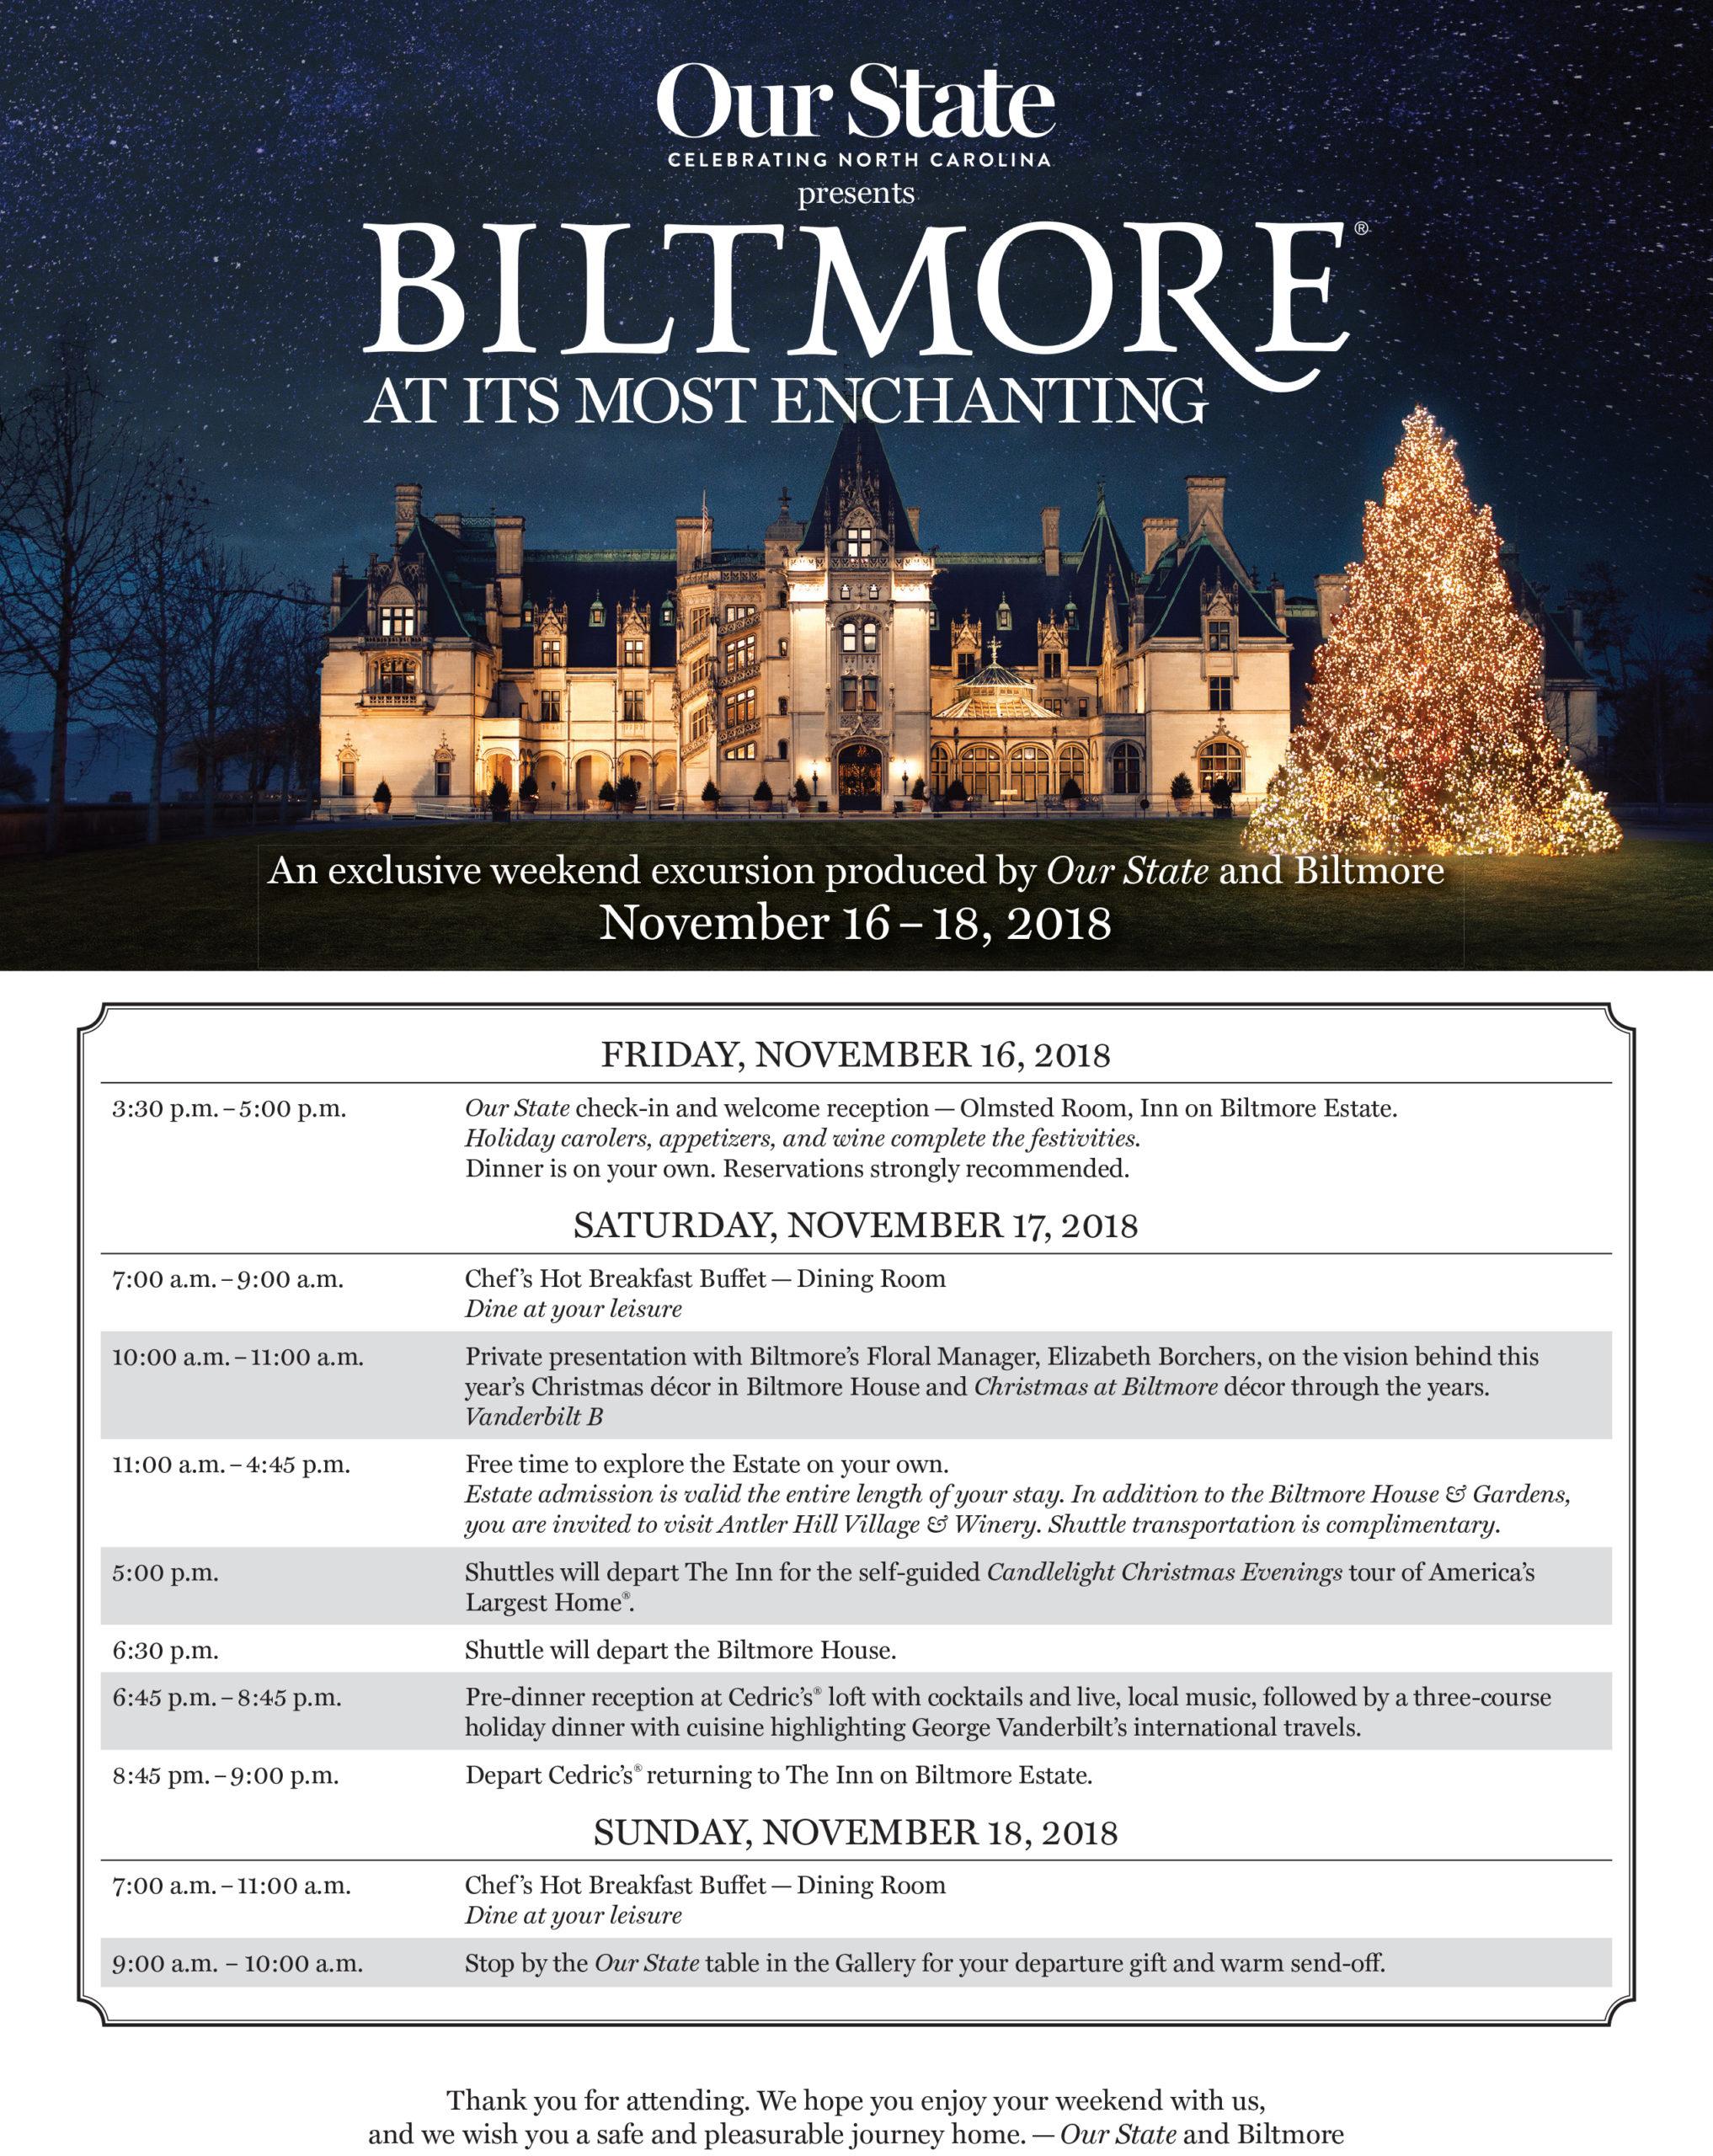 2018 Biltmore schedule.indd